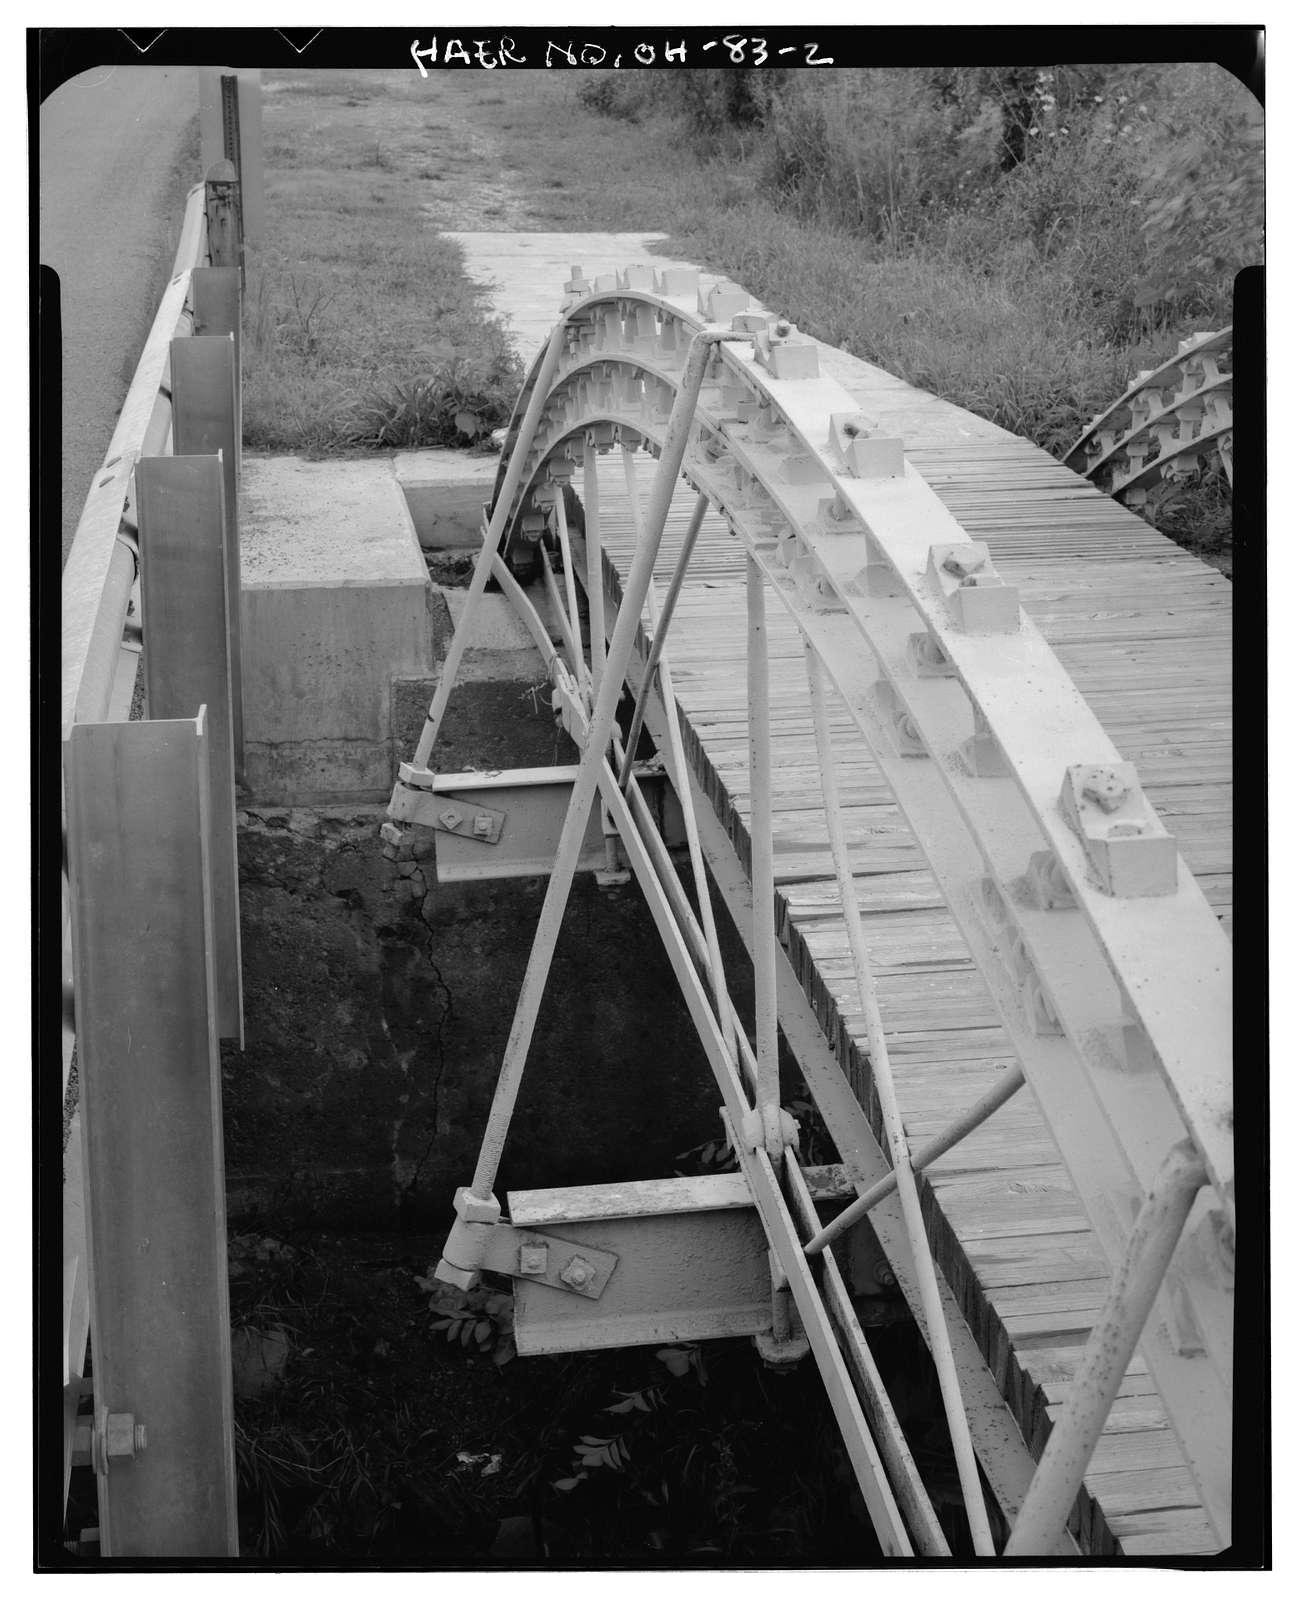 Egypt Pike Bridge, Egypt Pike (County Road 21) spanning Mud Run, New Holland, Pickaway County, OH